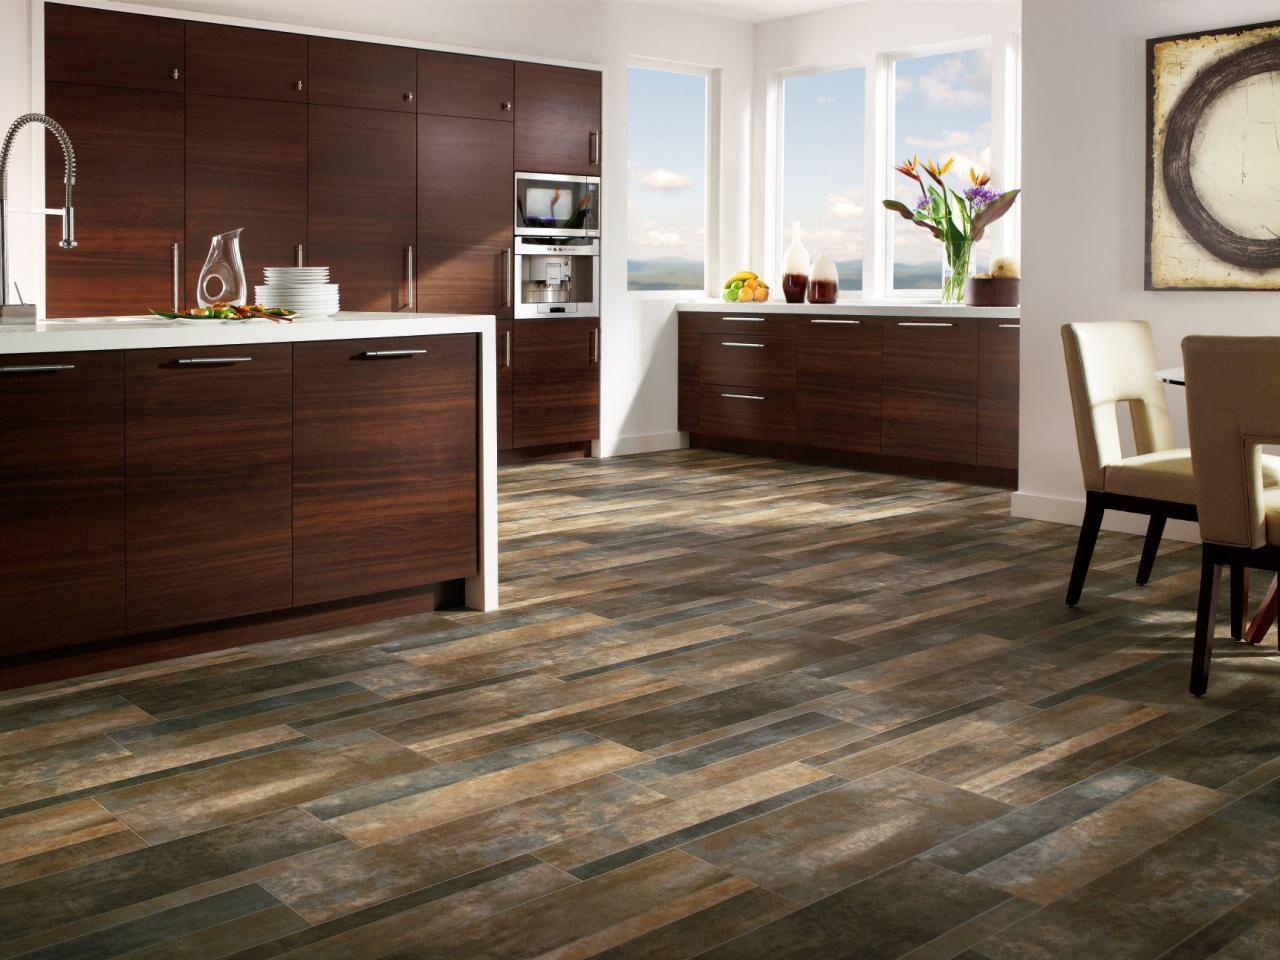 Beautiful Realistic Hard Wood Vinyl Flooring Available